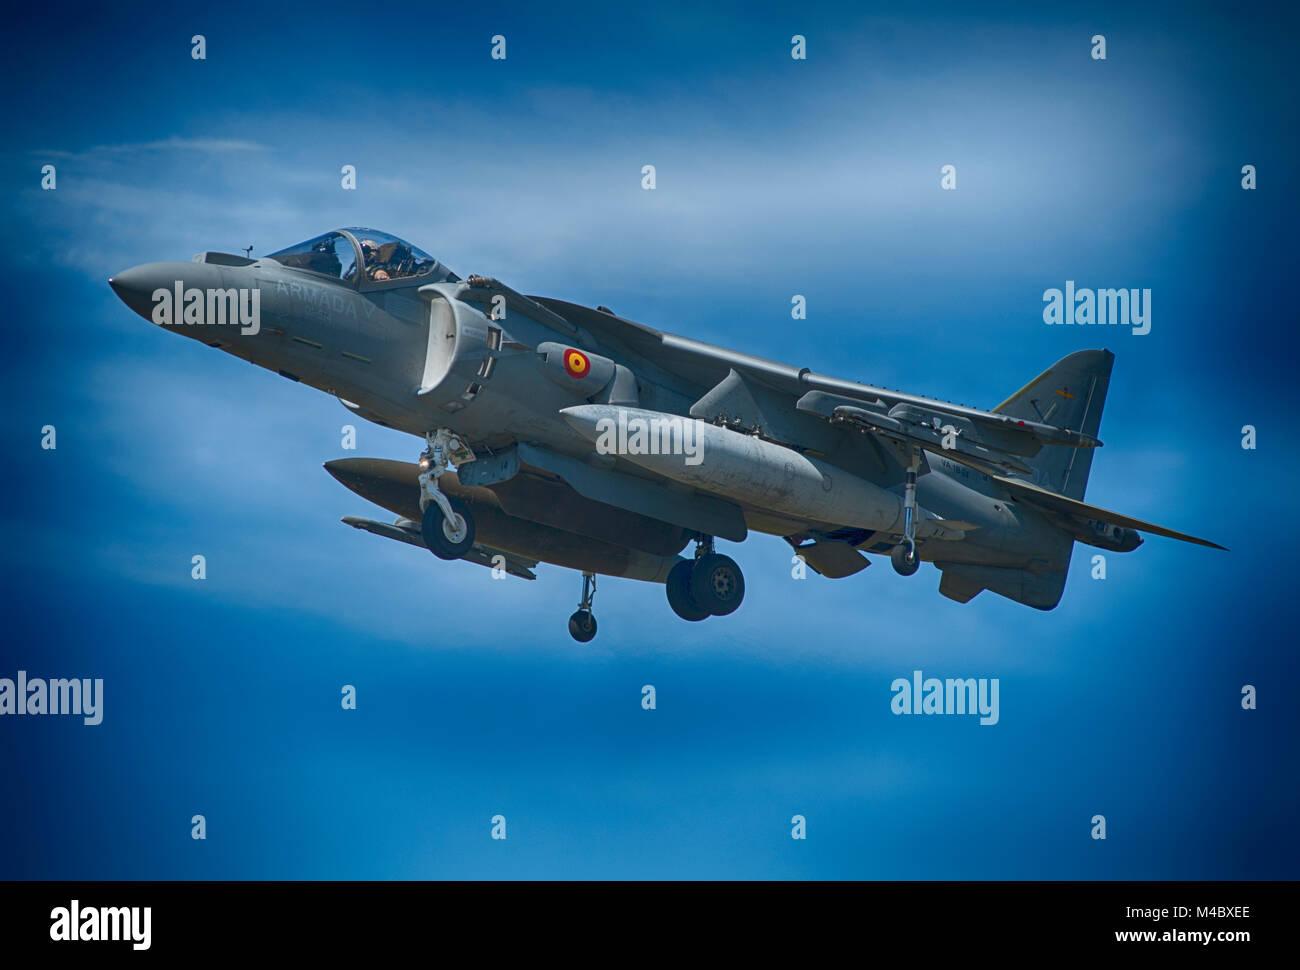 Spanish Navy McDonnell Douglas AV-8B Harrier II VTOL flying demo at the Farnborough International Trade Airshow, Stock Photo